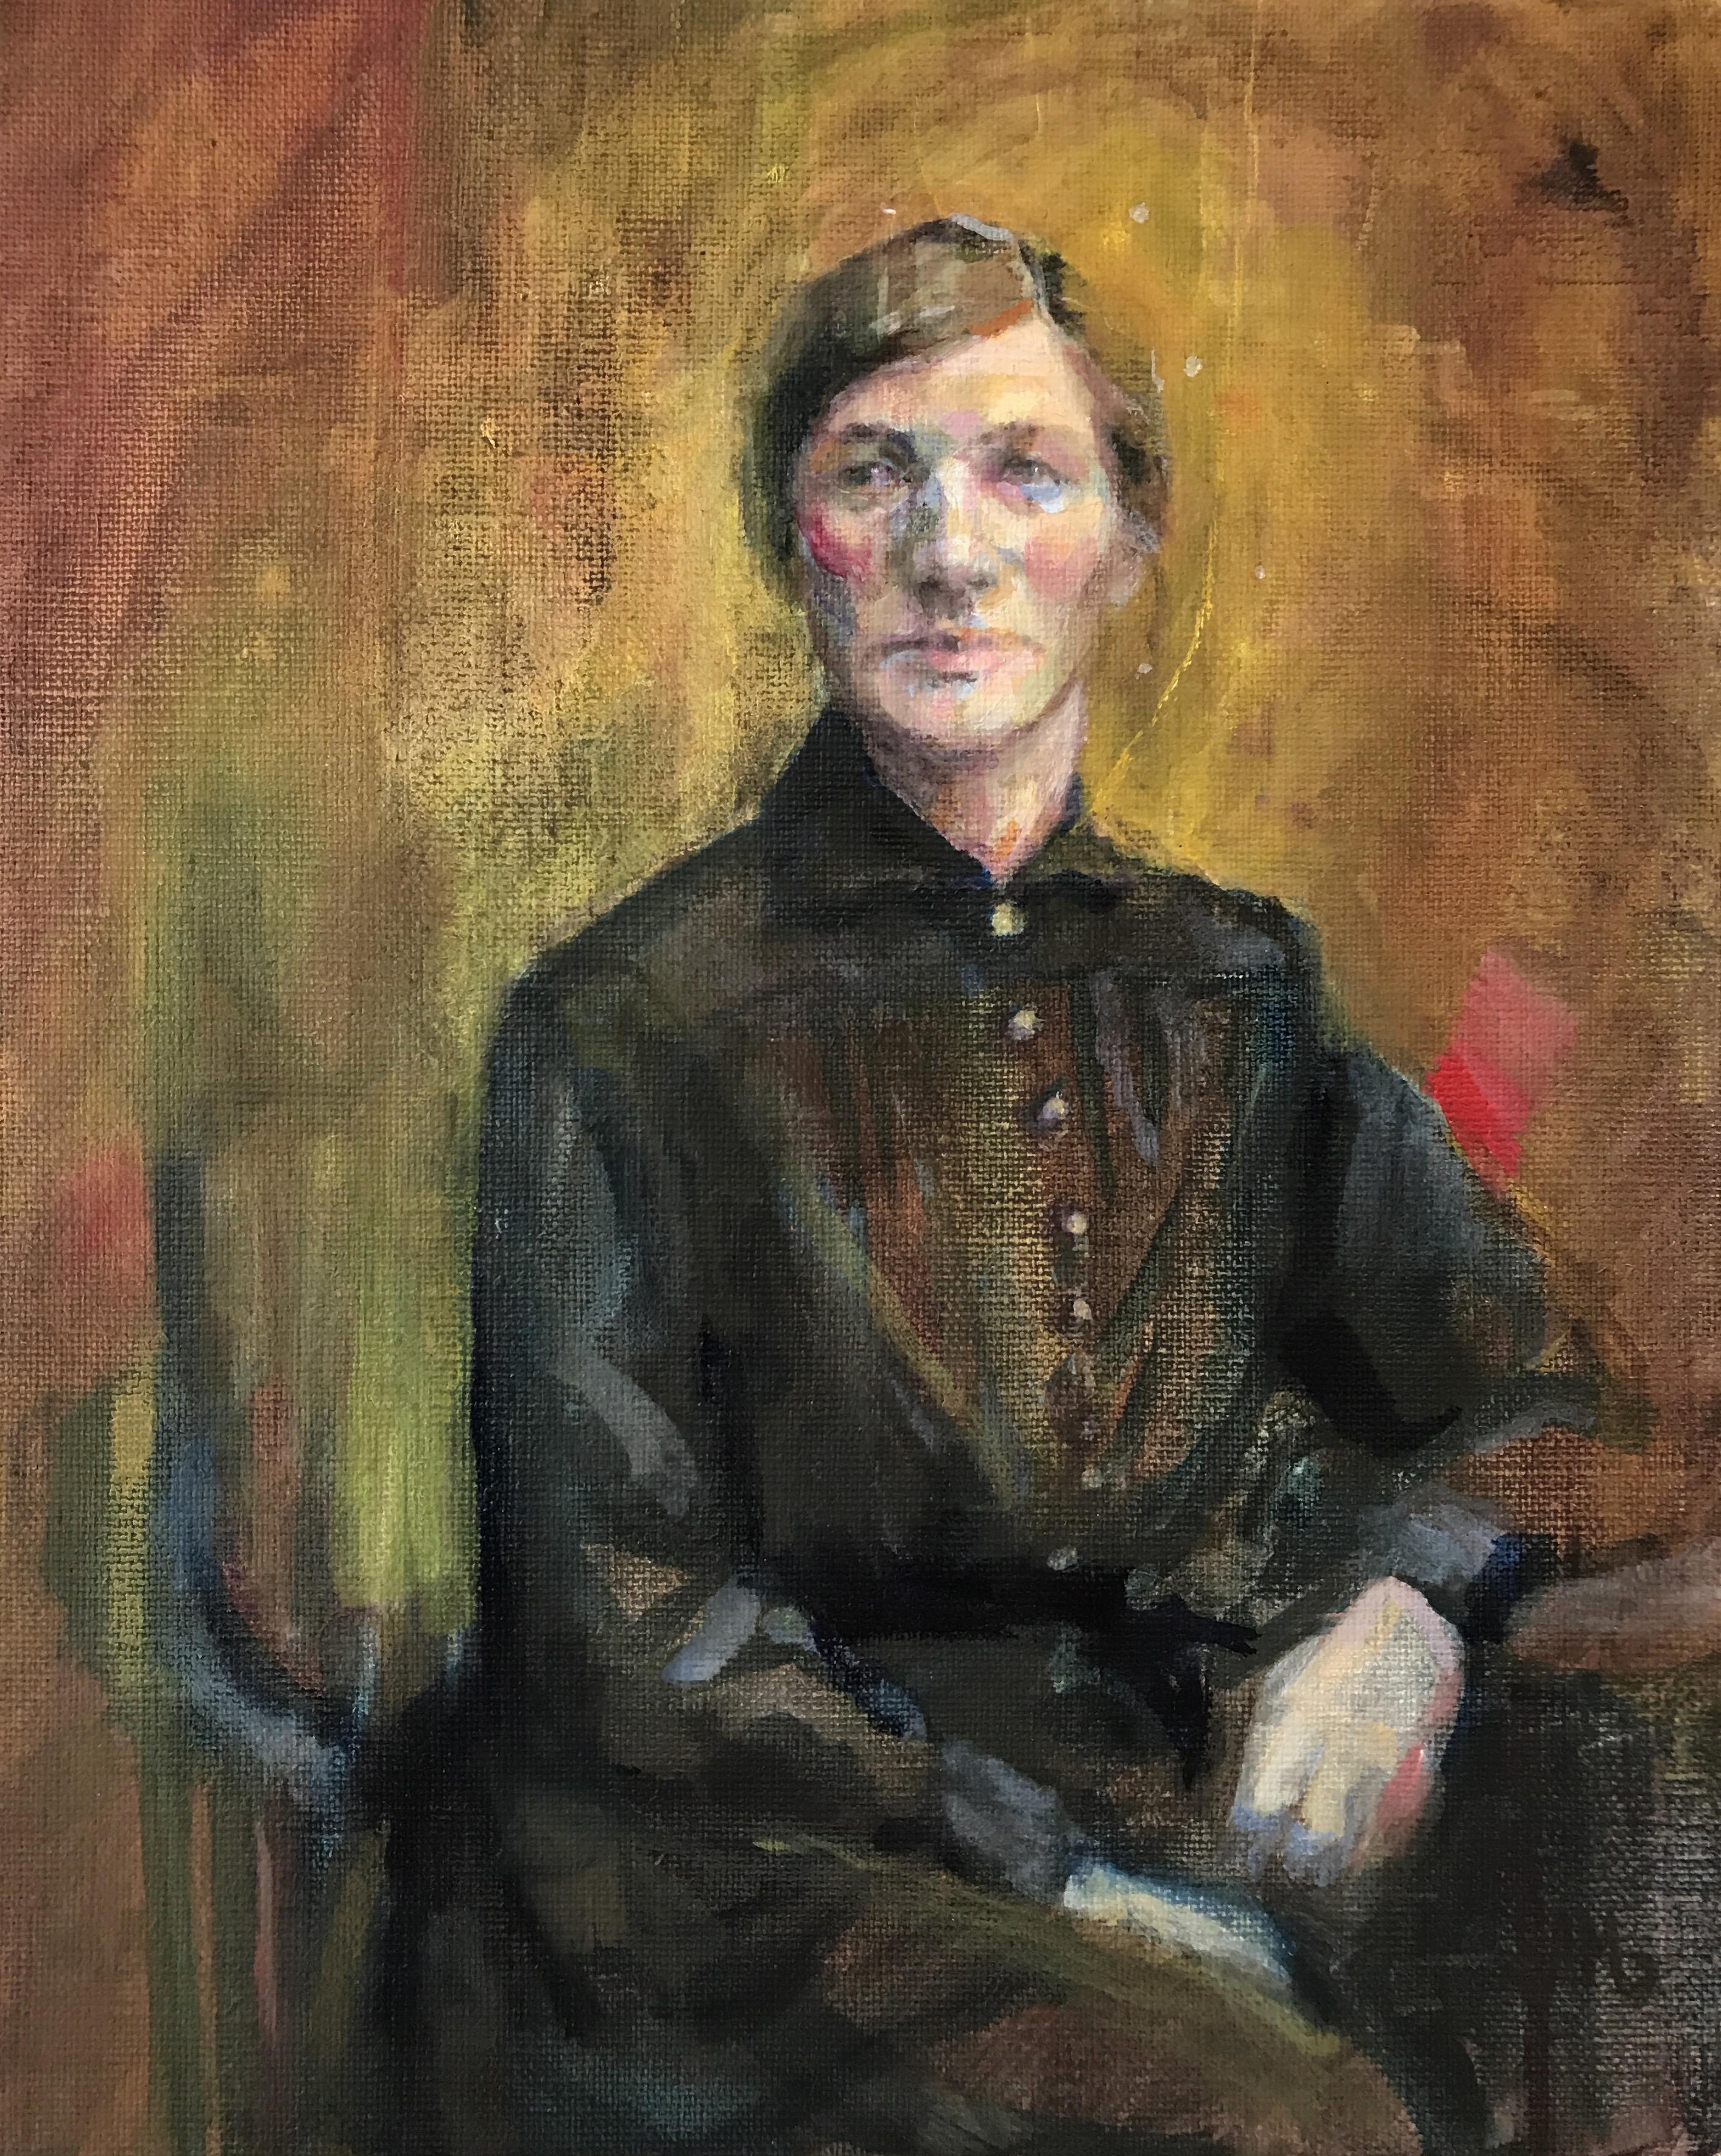 Angelica Markén 2017 inherited dreams